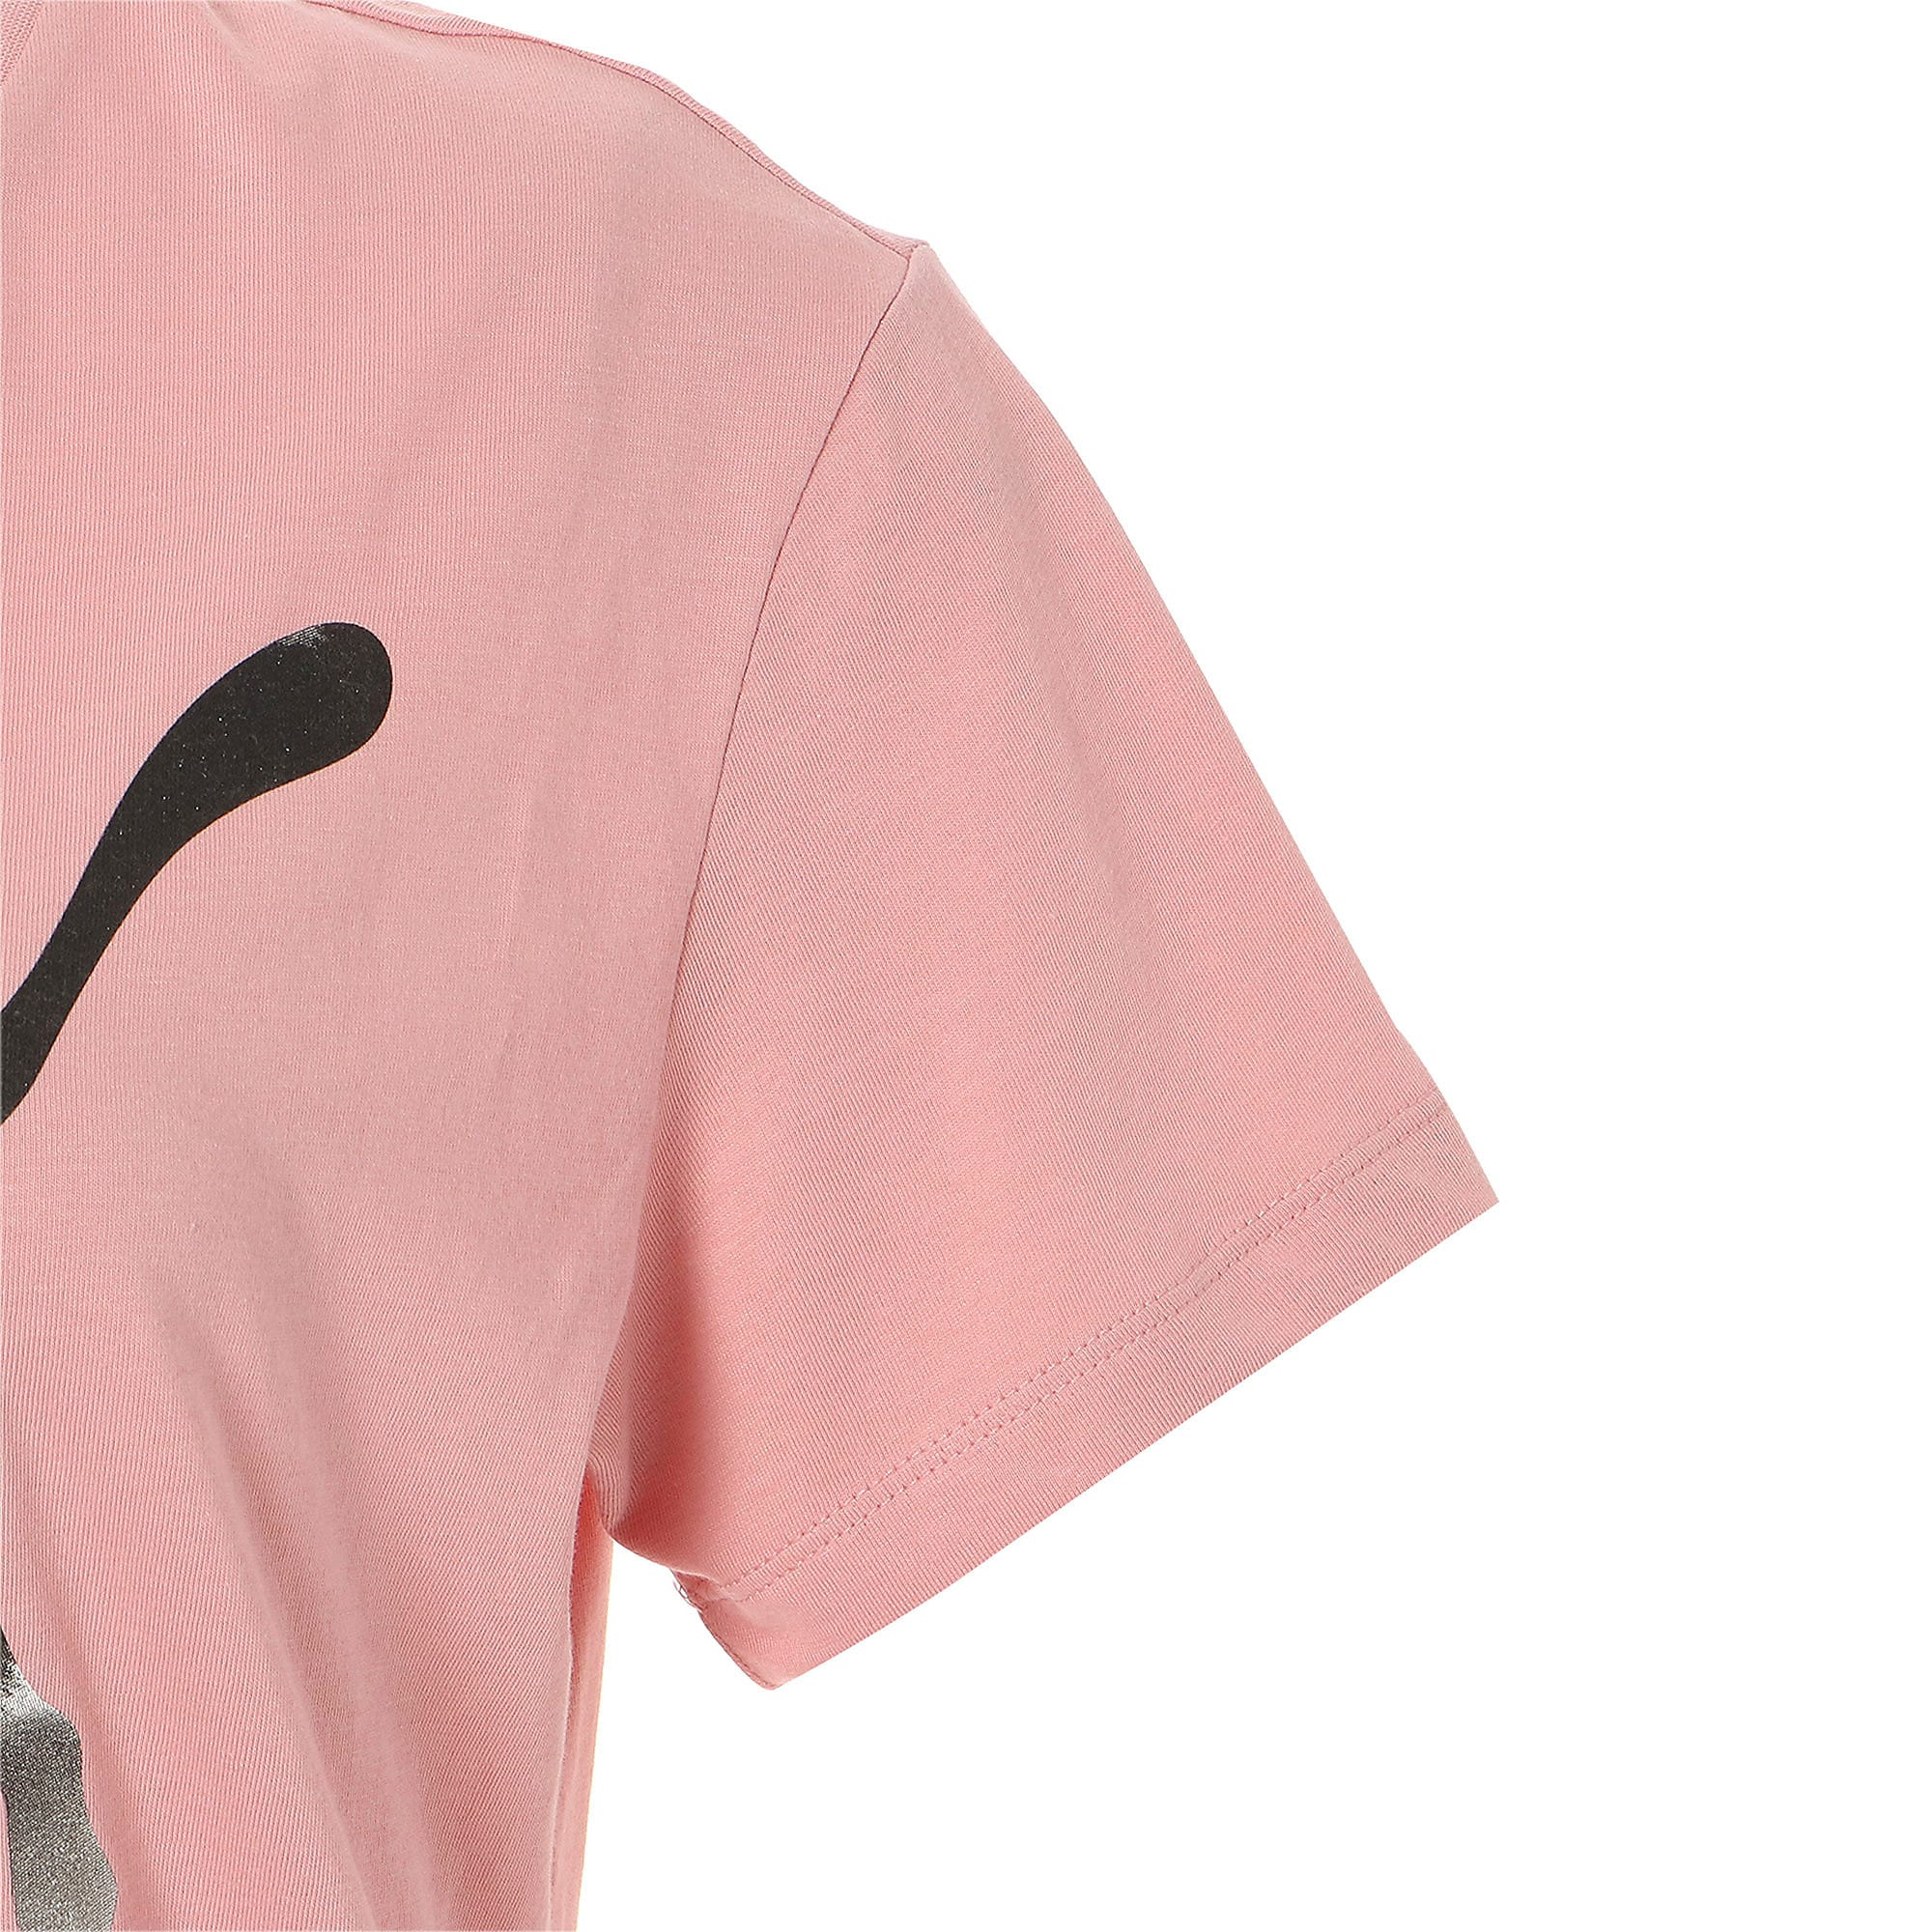 Thumbnail 5 of CLOUD パック ウィメンズ グラフィック Tシャツ, Bridal Rose, medium-JPN